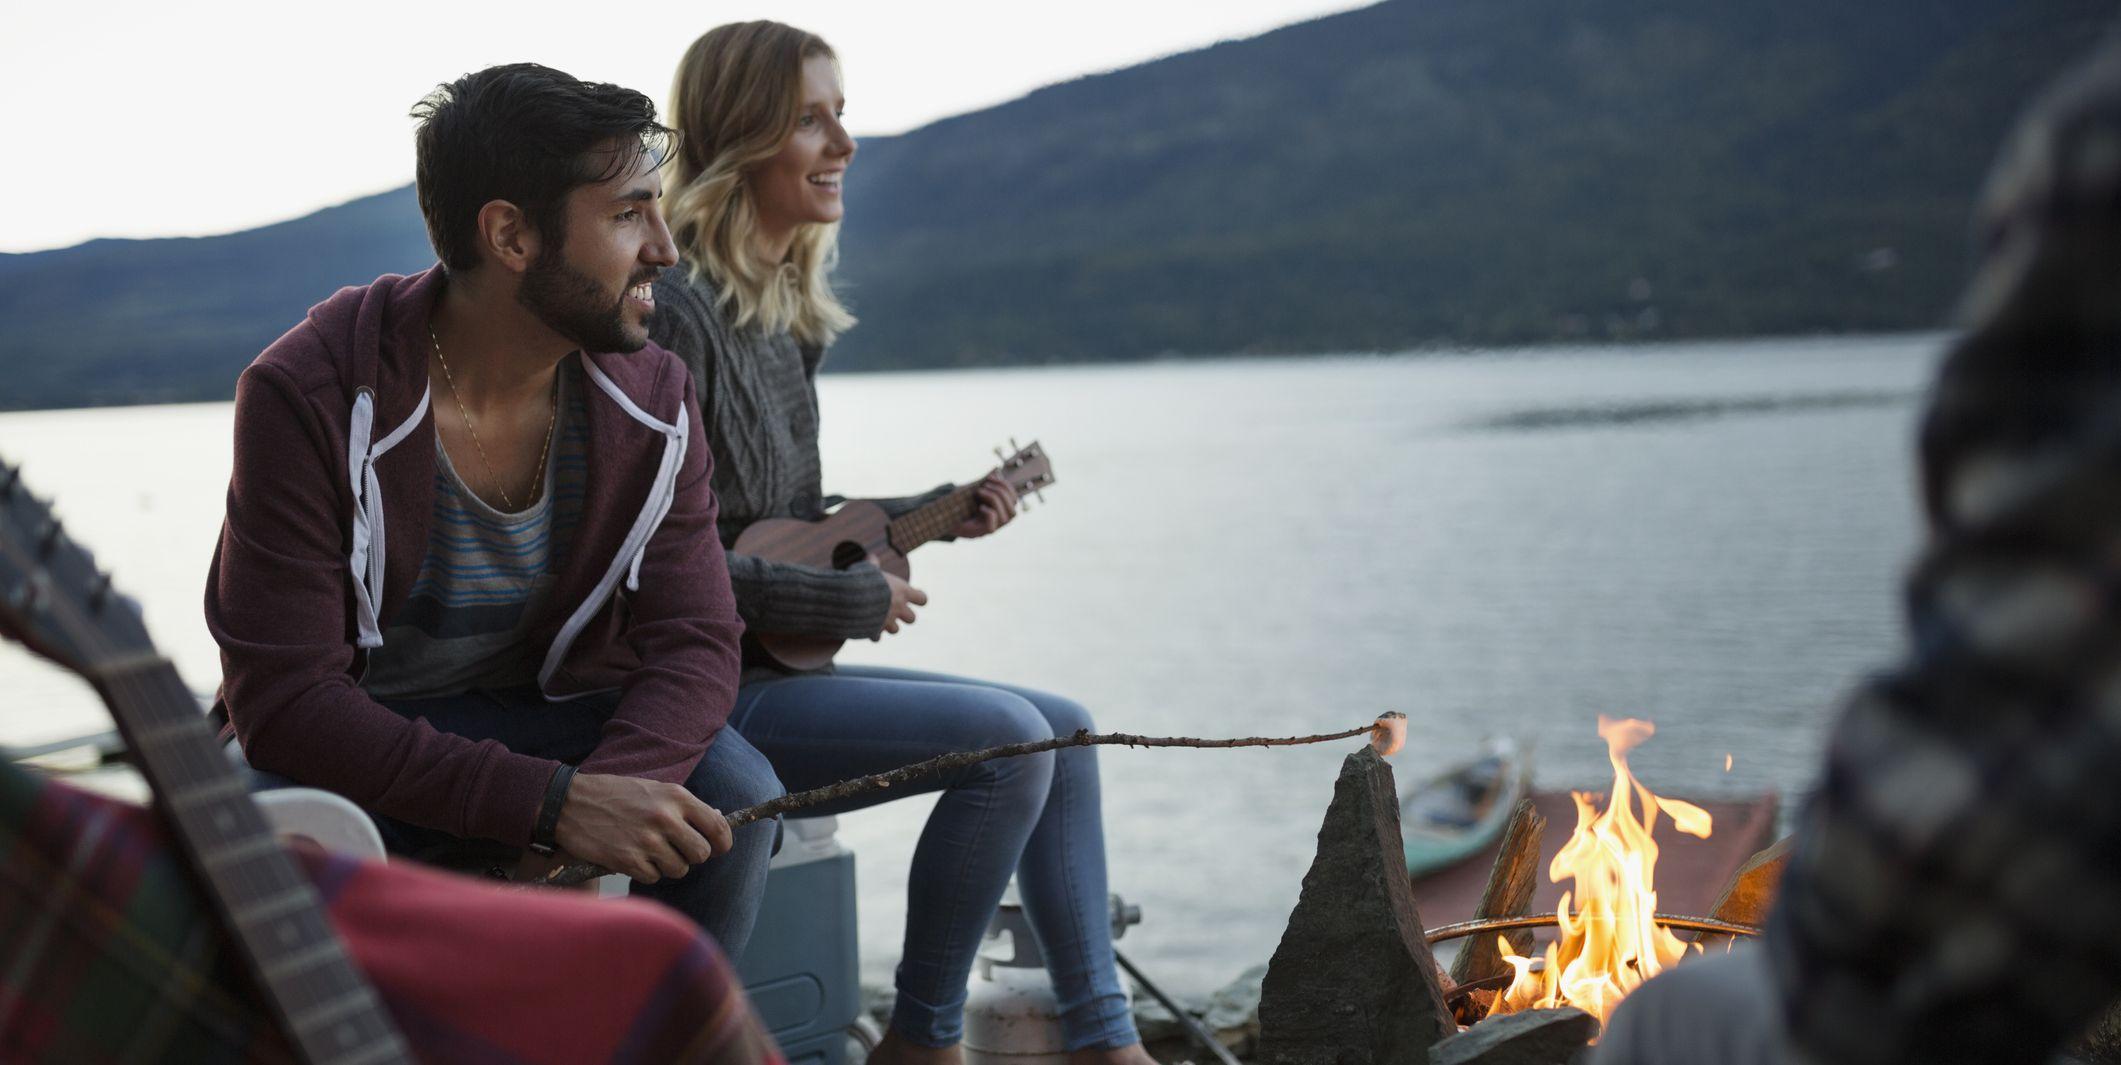 Young friends roasting marshmallows playing ukulele lakeside campfire